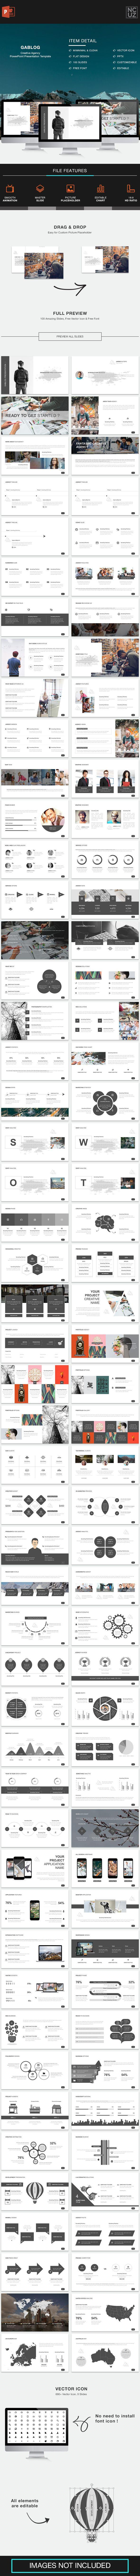 Gablog Creative Agency PowerPoint Template. Download here: https://graphicriver.net/item/gablog-creative-agency-powerpoint-template/17701000?ref=ksioks